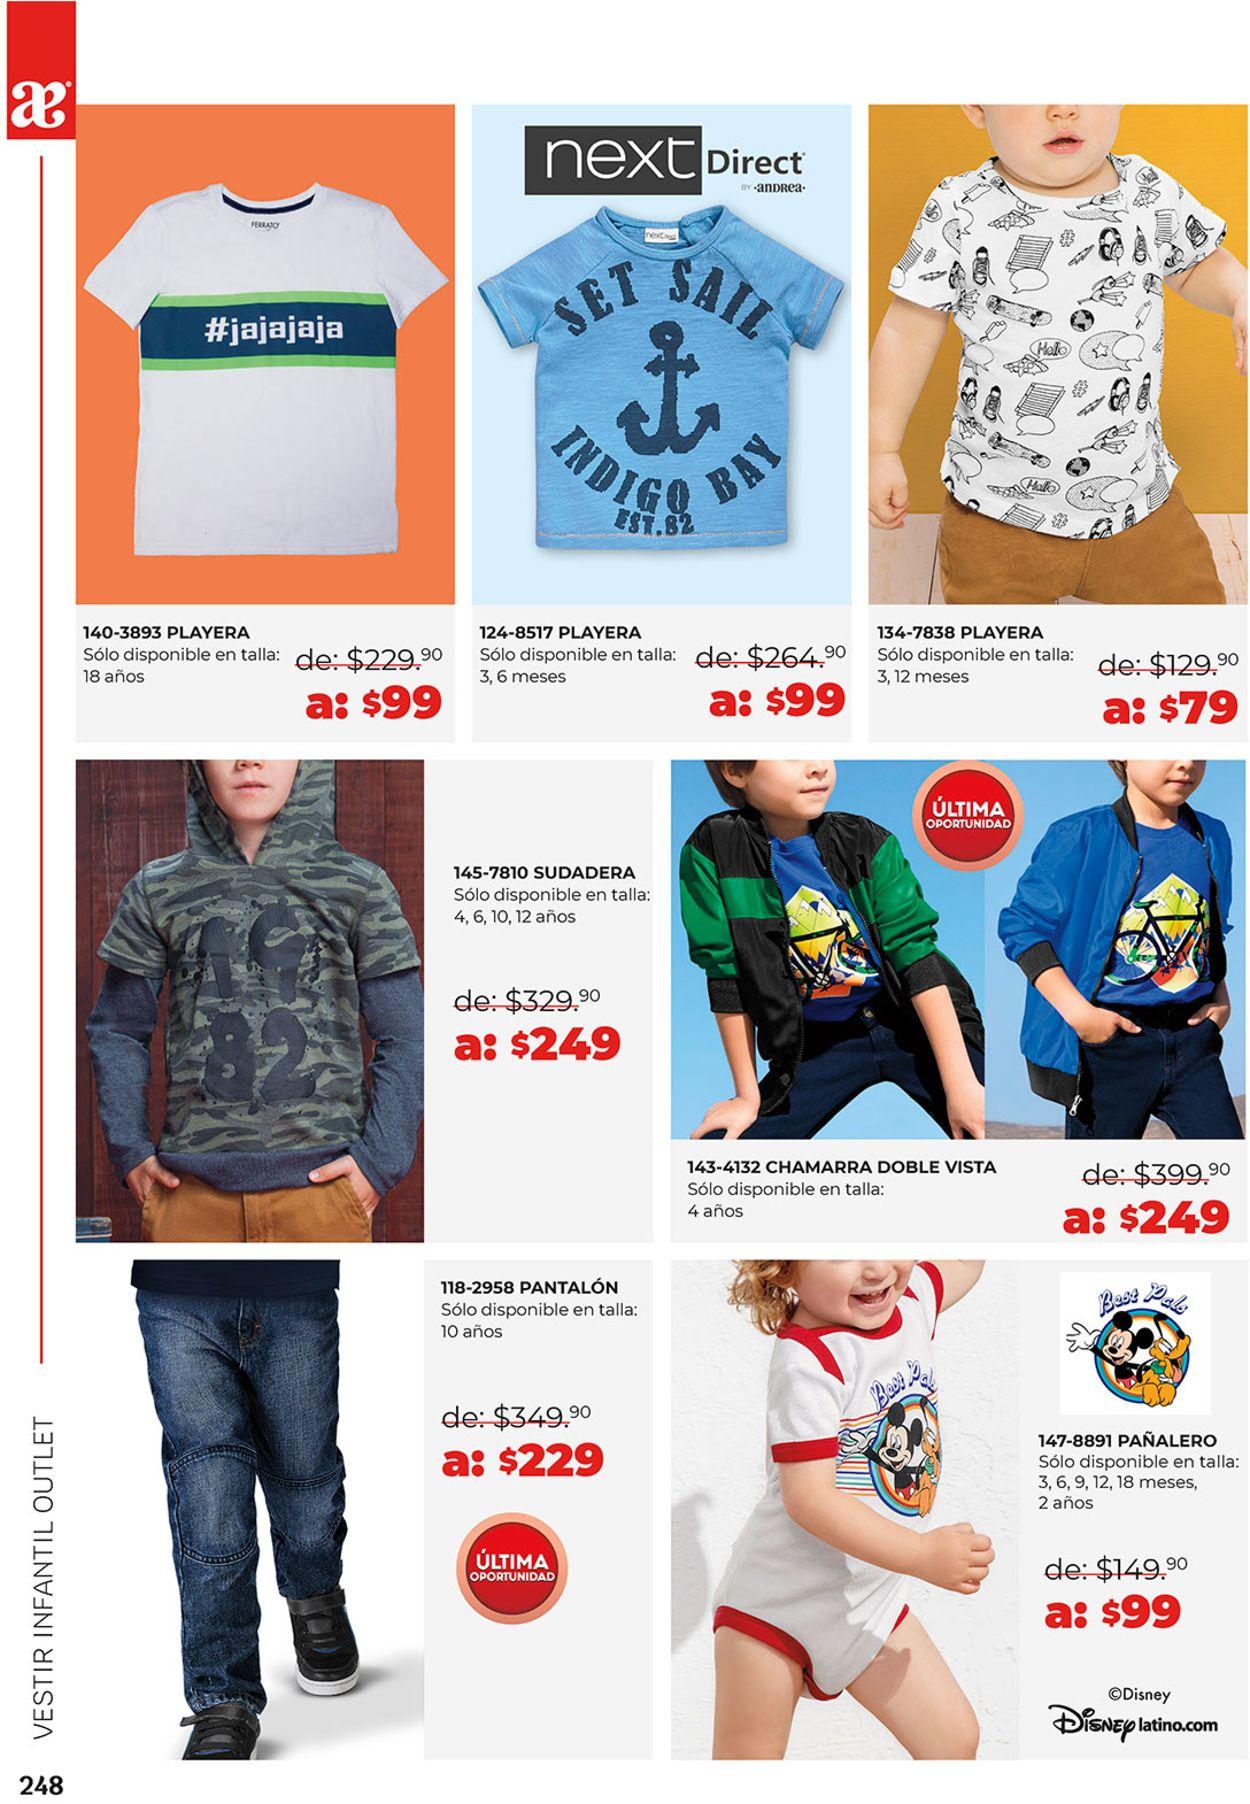 Andrea Folleto - 05.06-18.07.2020 (Página 248)